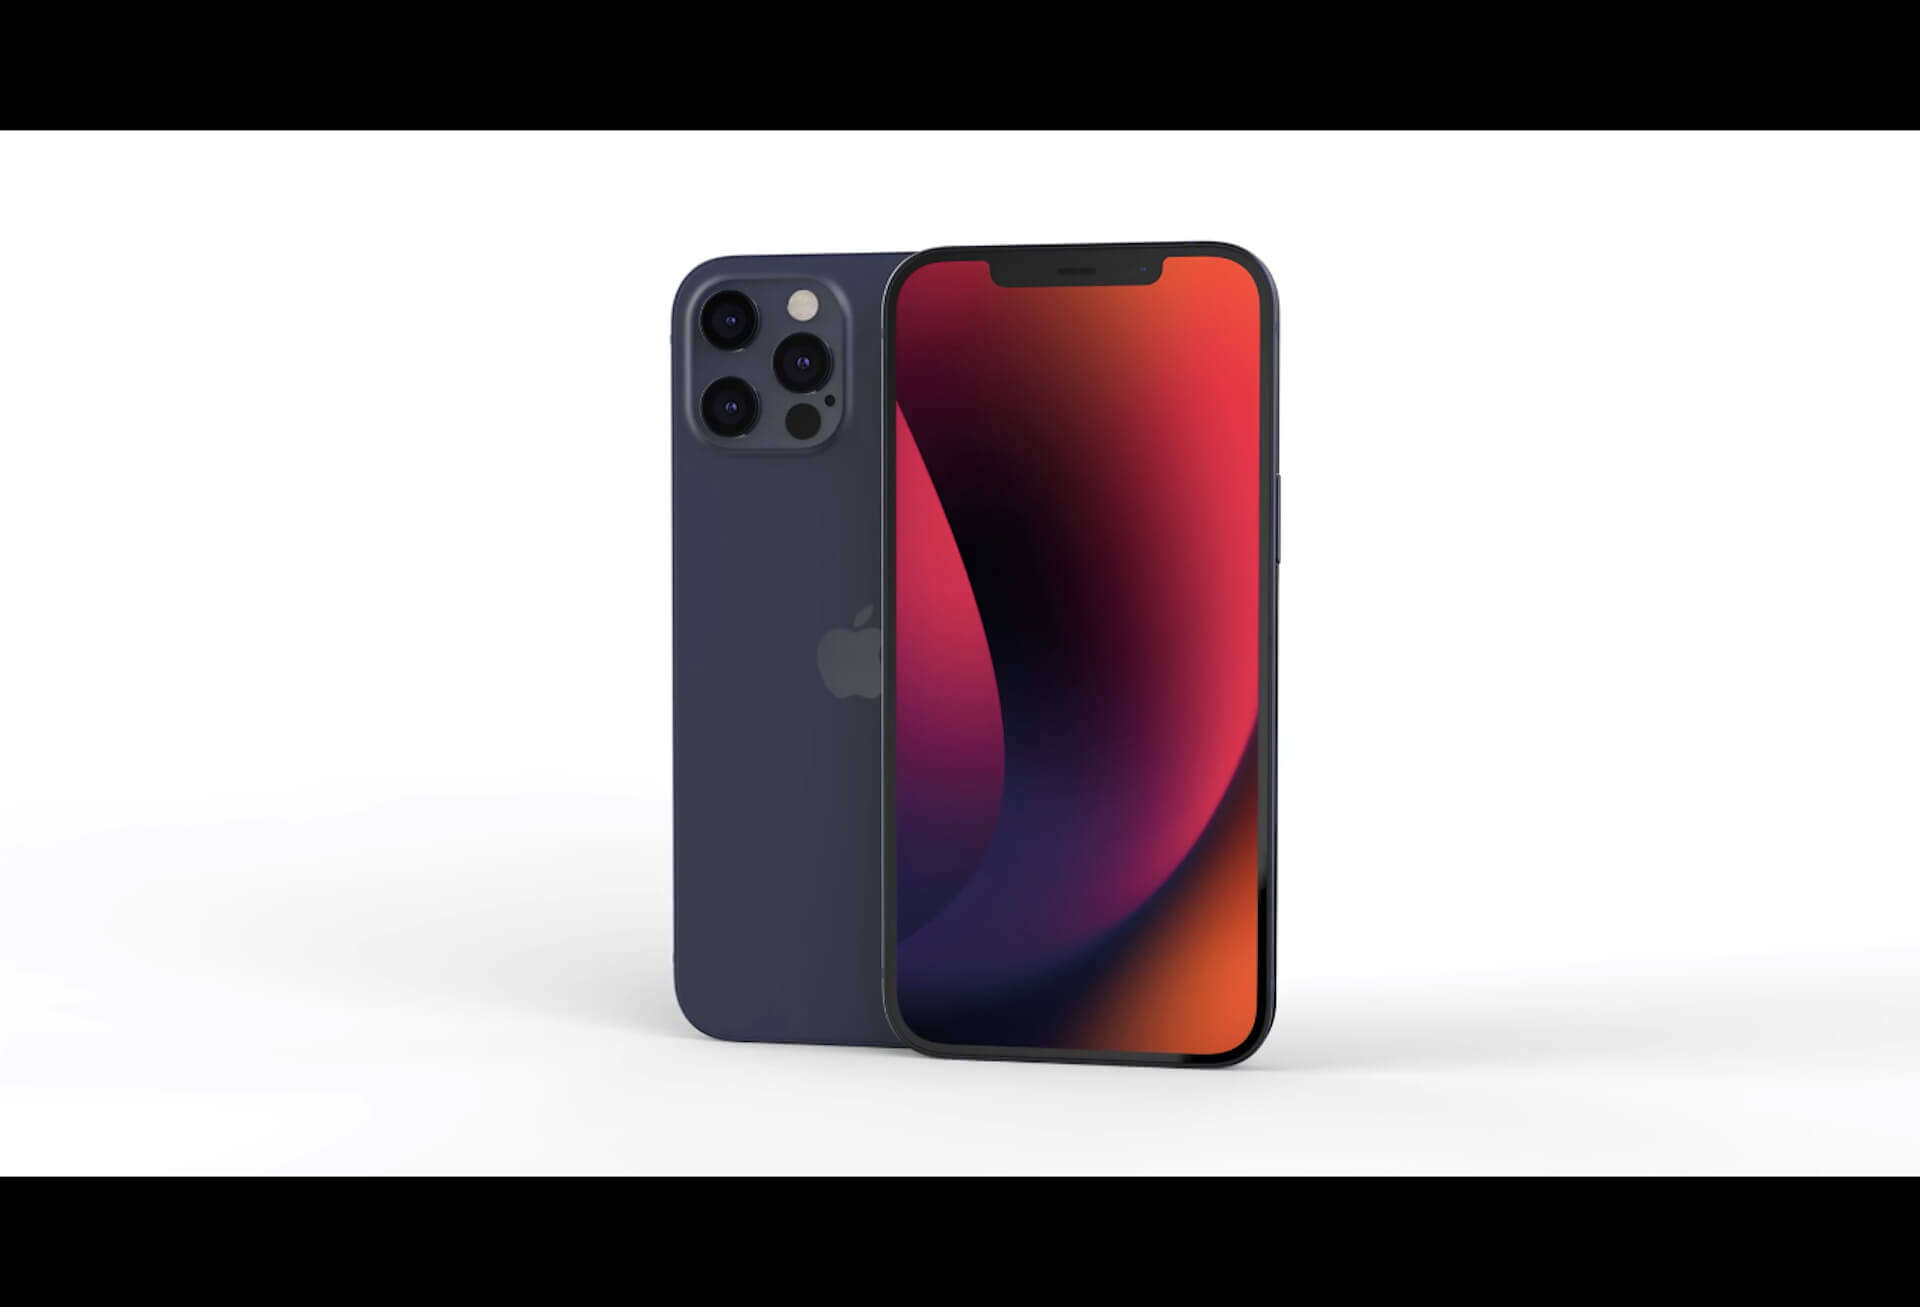 iPhone 12 ProシリーズはProMotionディスプレイを採用しない!?来年のiPhoneで搭載か tech200702_iphone12_display_main